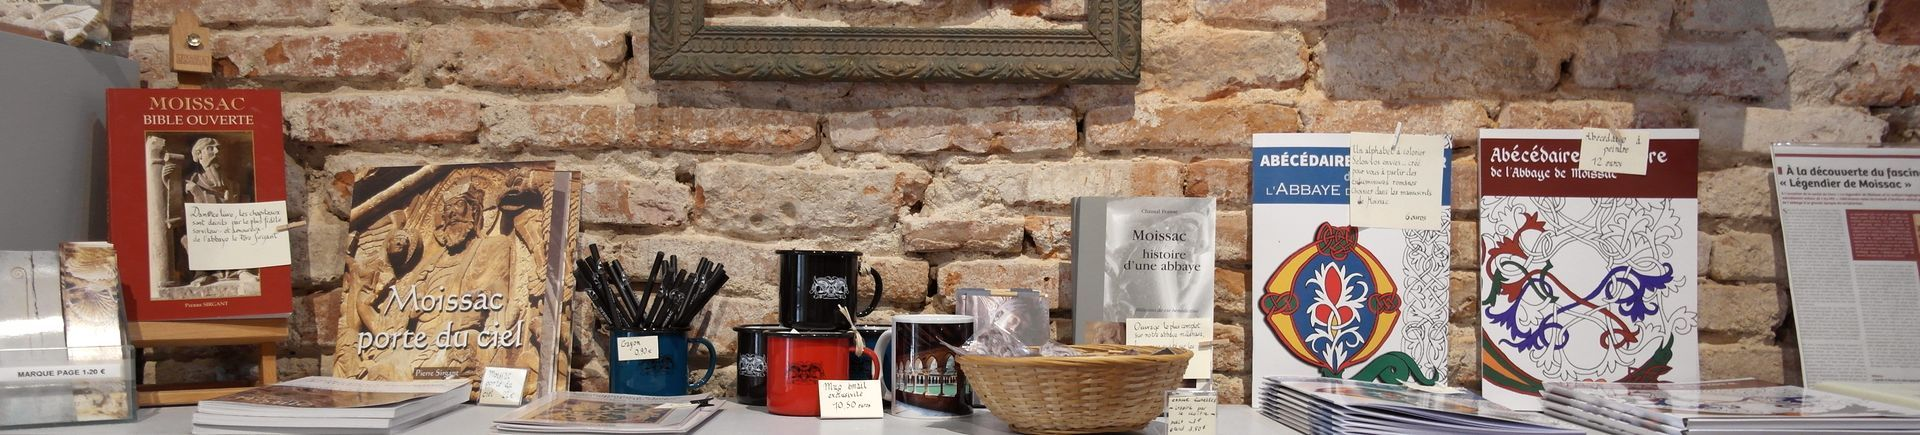 Boutique Abbaye Moissac Occitanie Sud-Ouest